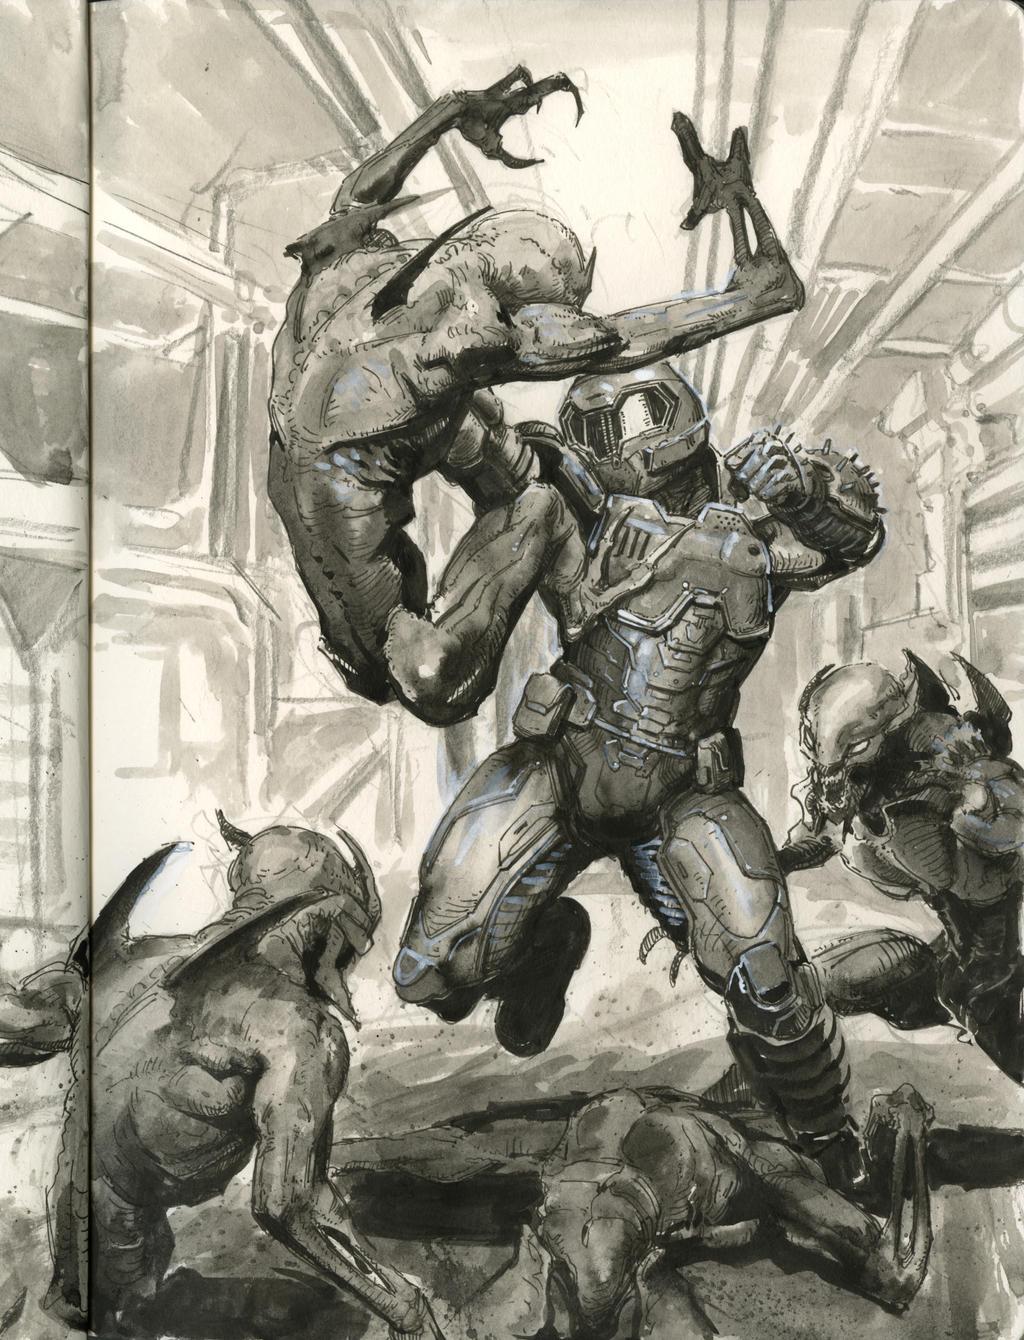 Doom Slayer Smash By Art Tool On Deviantart